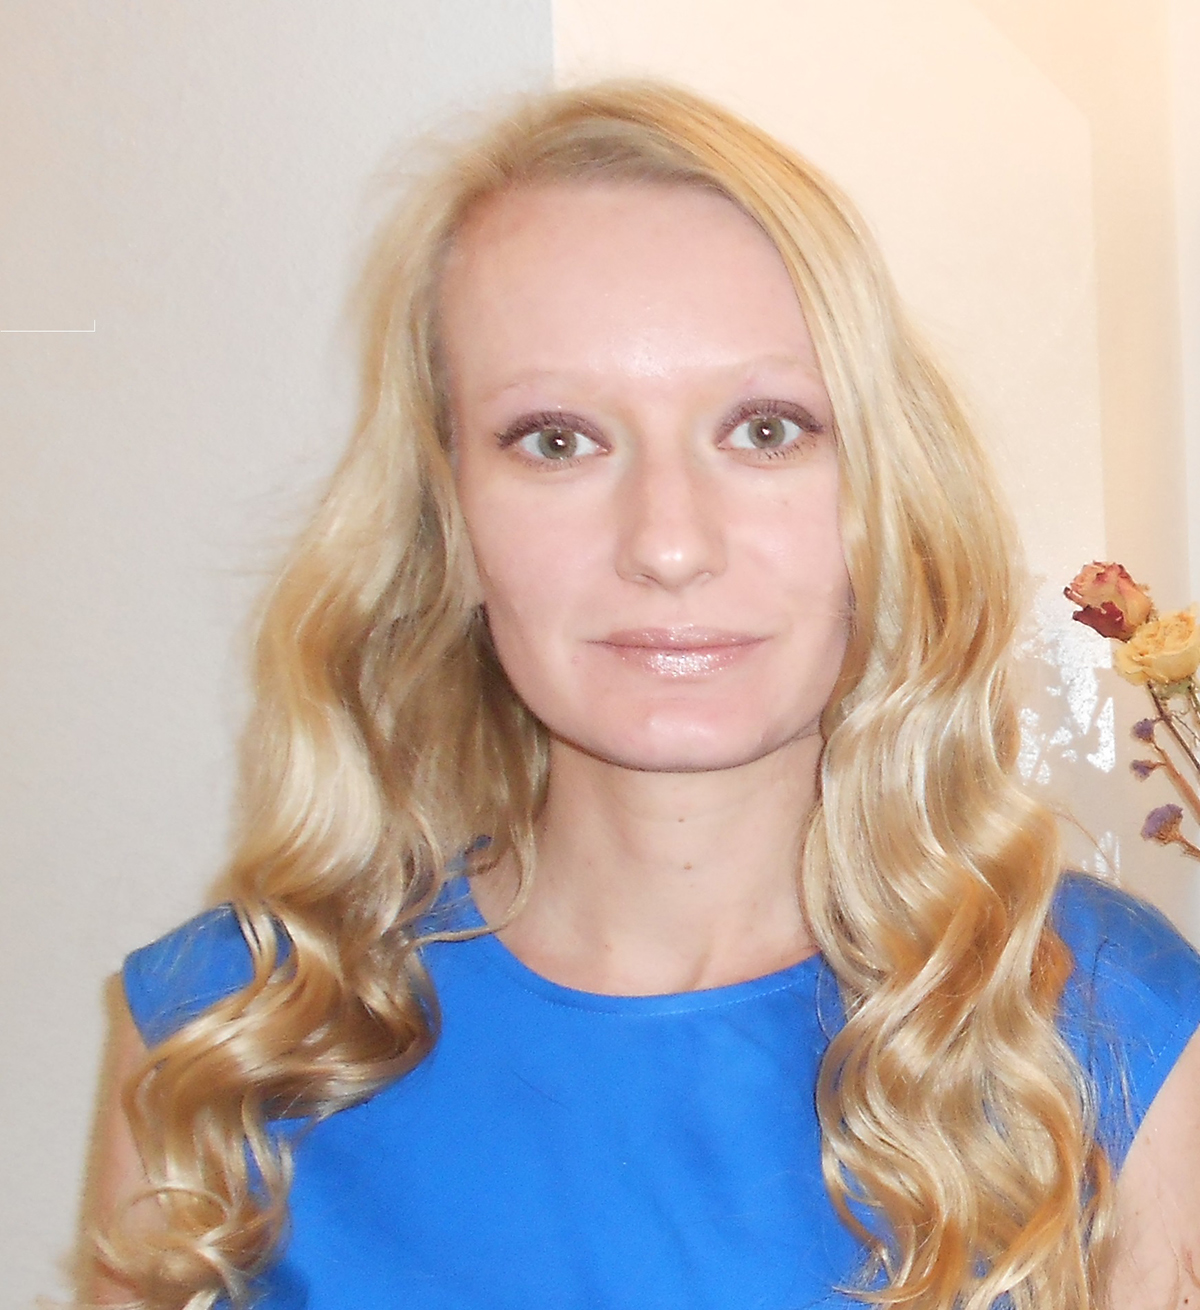 Olga Pilkington | Photo courtesy of DSU, St. George News